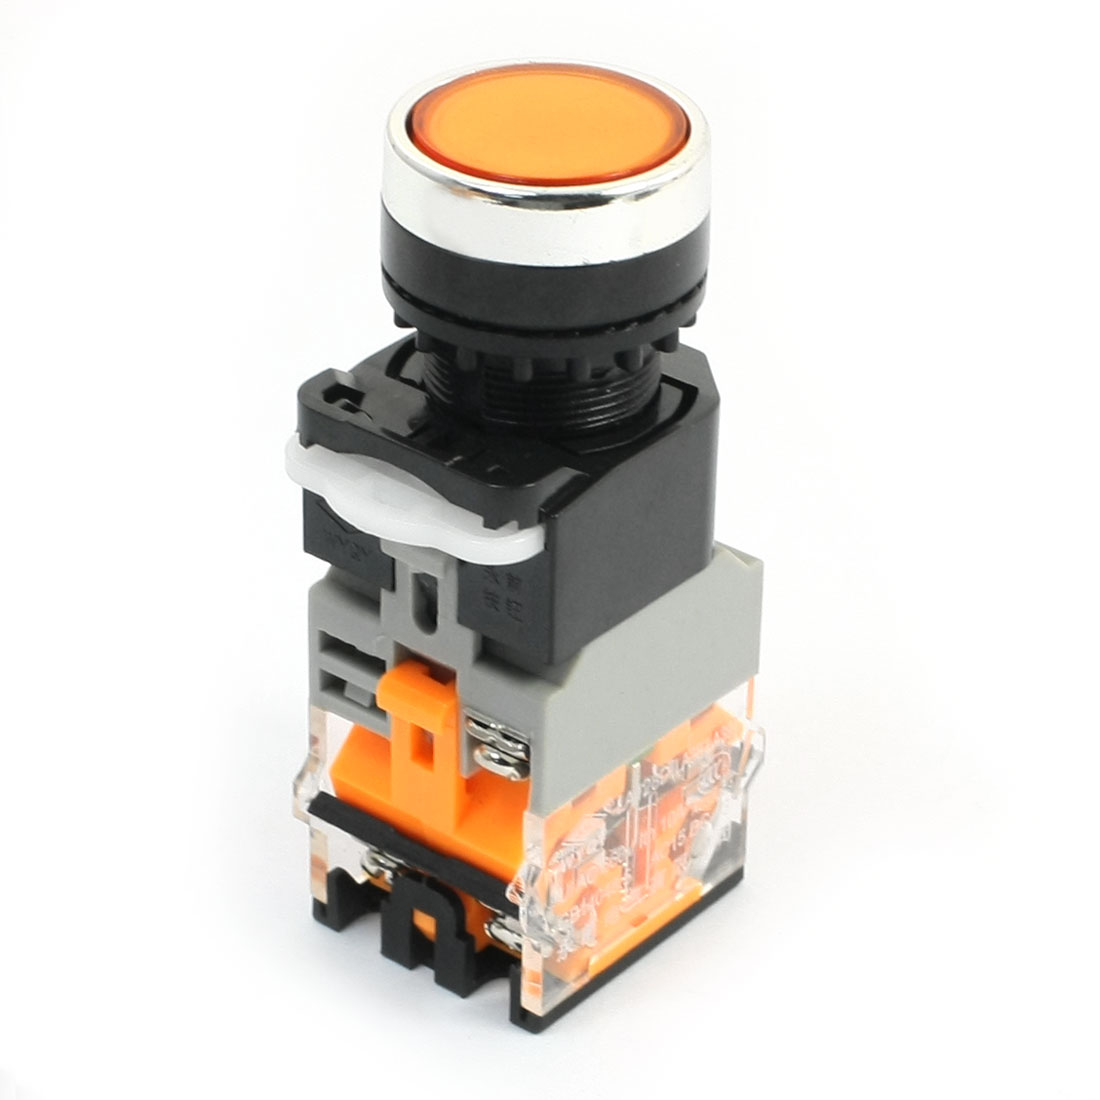 Machine Start DPST Momentary 1NO+1NC Orange Lamp Push Button Switch 660V 10A